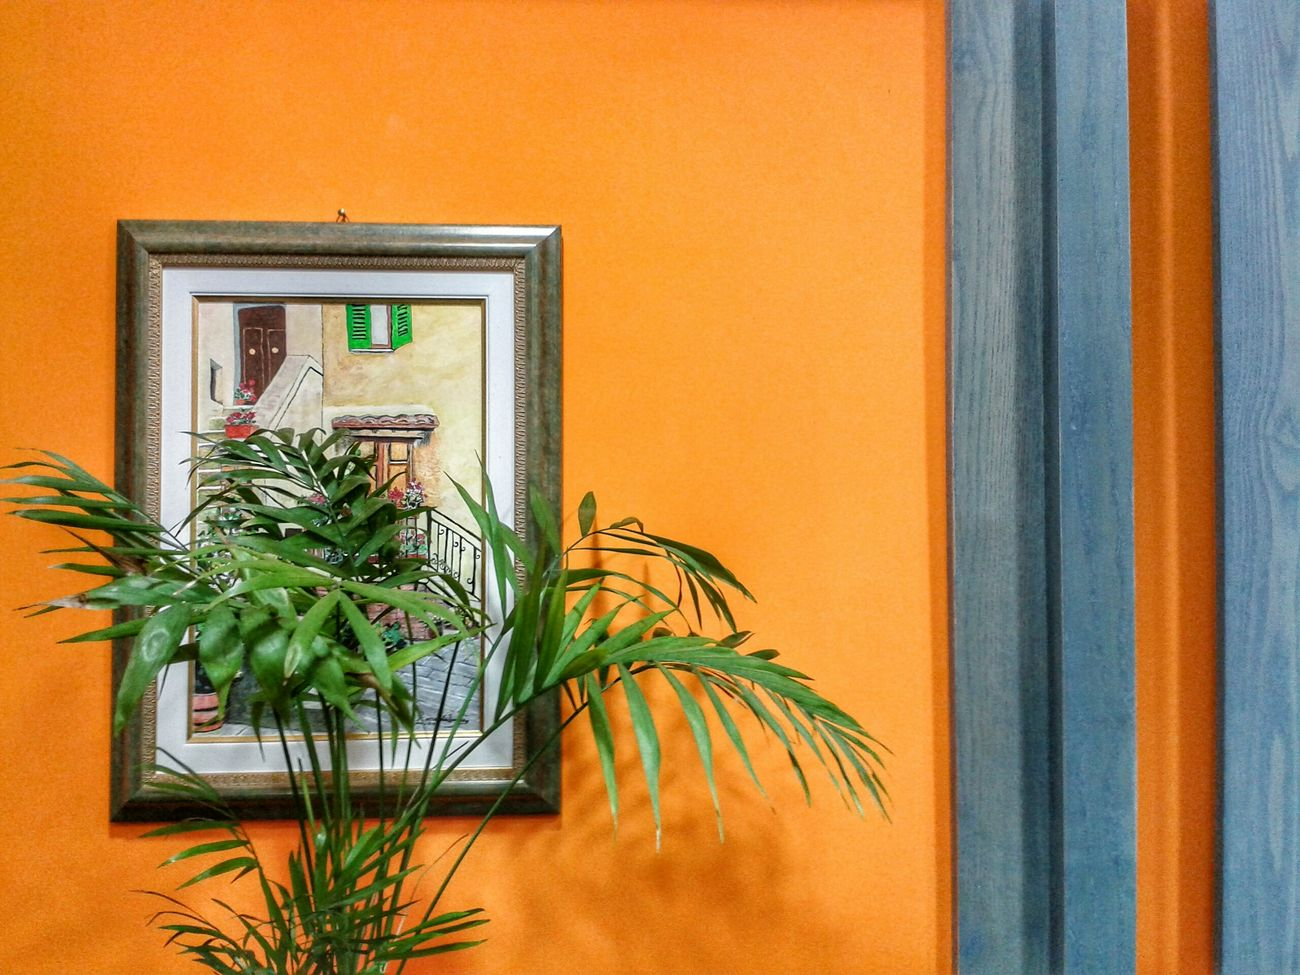 """Living nature"". Piantine Plants Quadro Painting Interior Design Shop Interior Orange Color Blue Blu e Arancione Smartphone Photography Mobile Photography S3mini Camerazoomfx in HDR shooting mode Exposure Bracketing No Edit/no Filter"